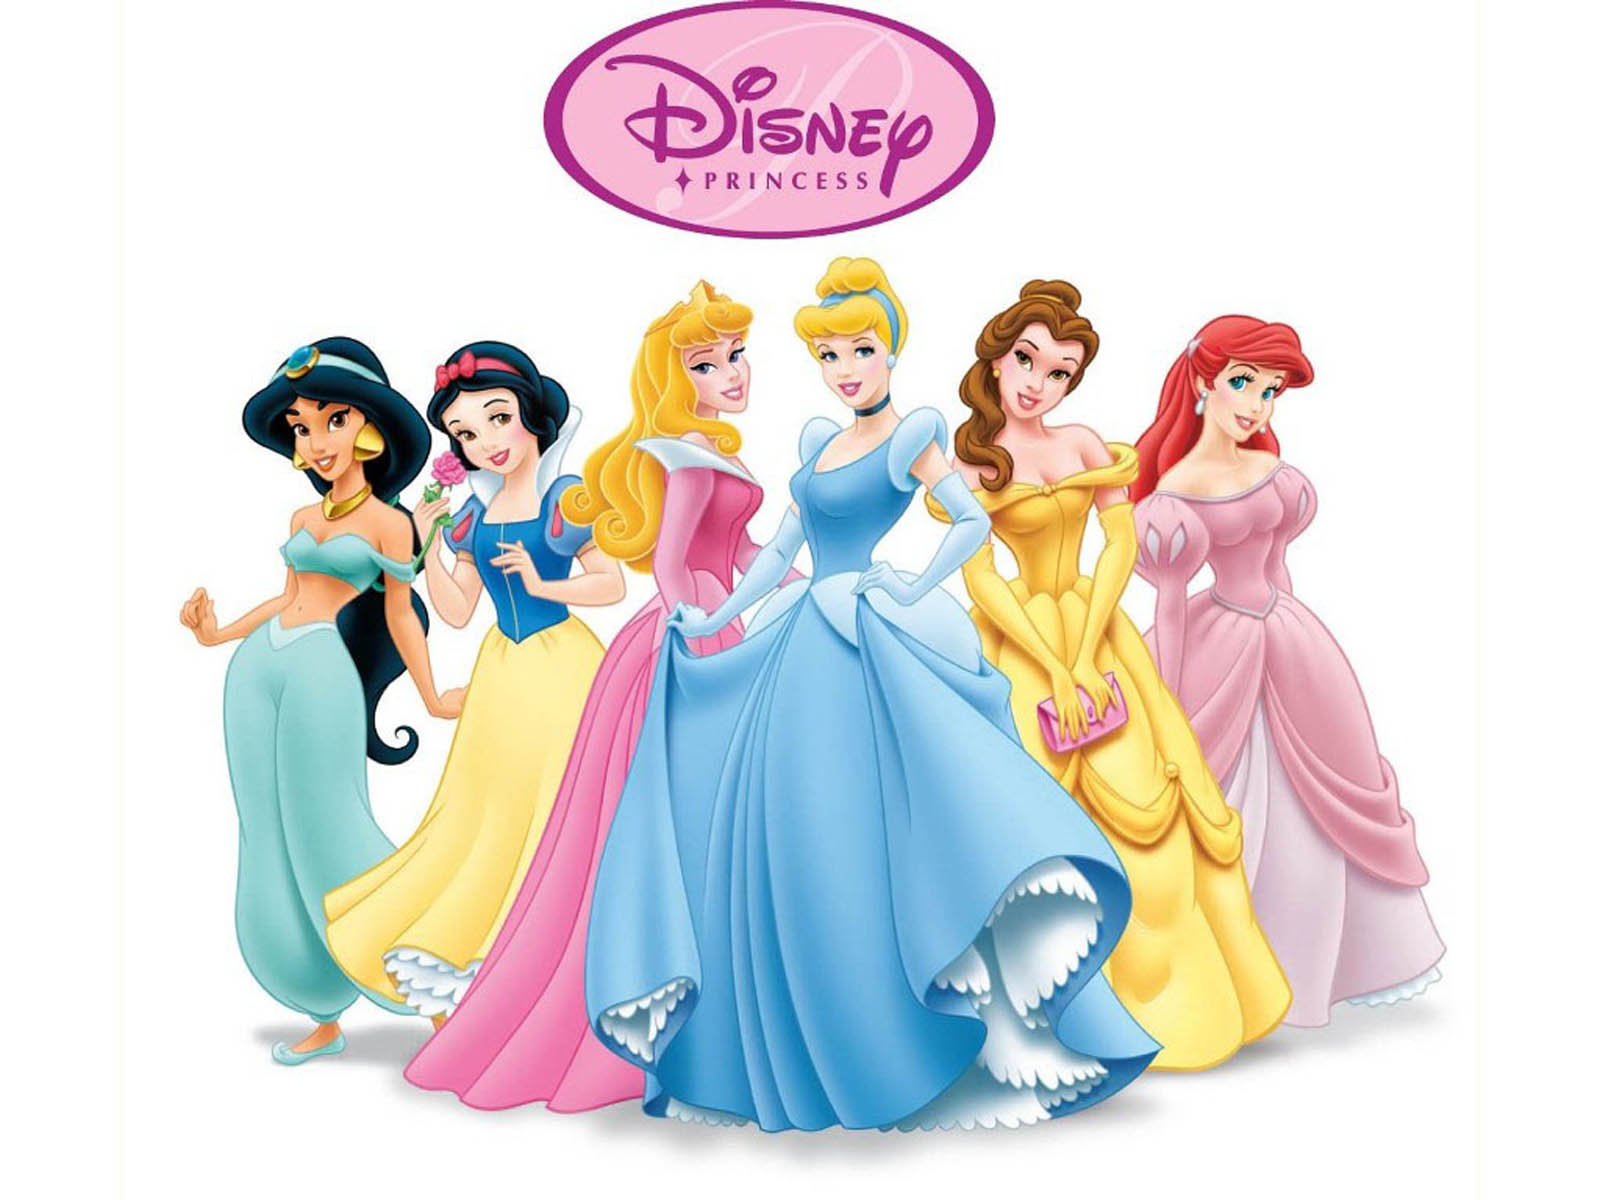 Wallpapers Disney Princess Wallpapers